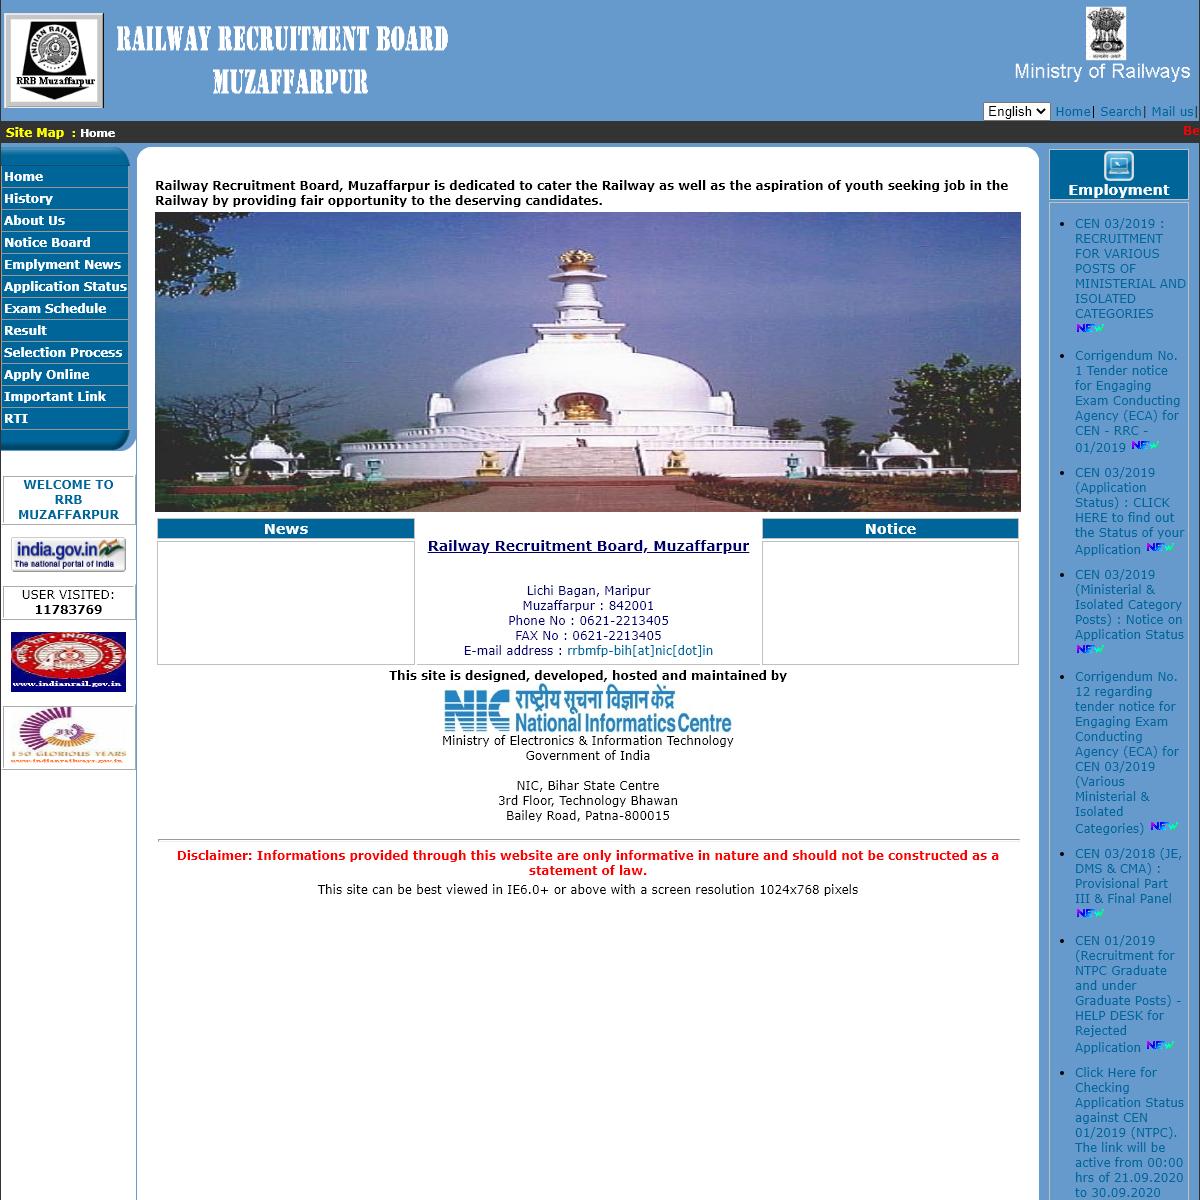 Railways Recruitment Board (RRB), Muzaffarpur